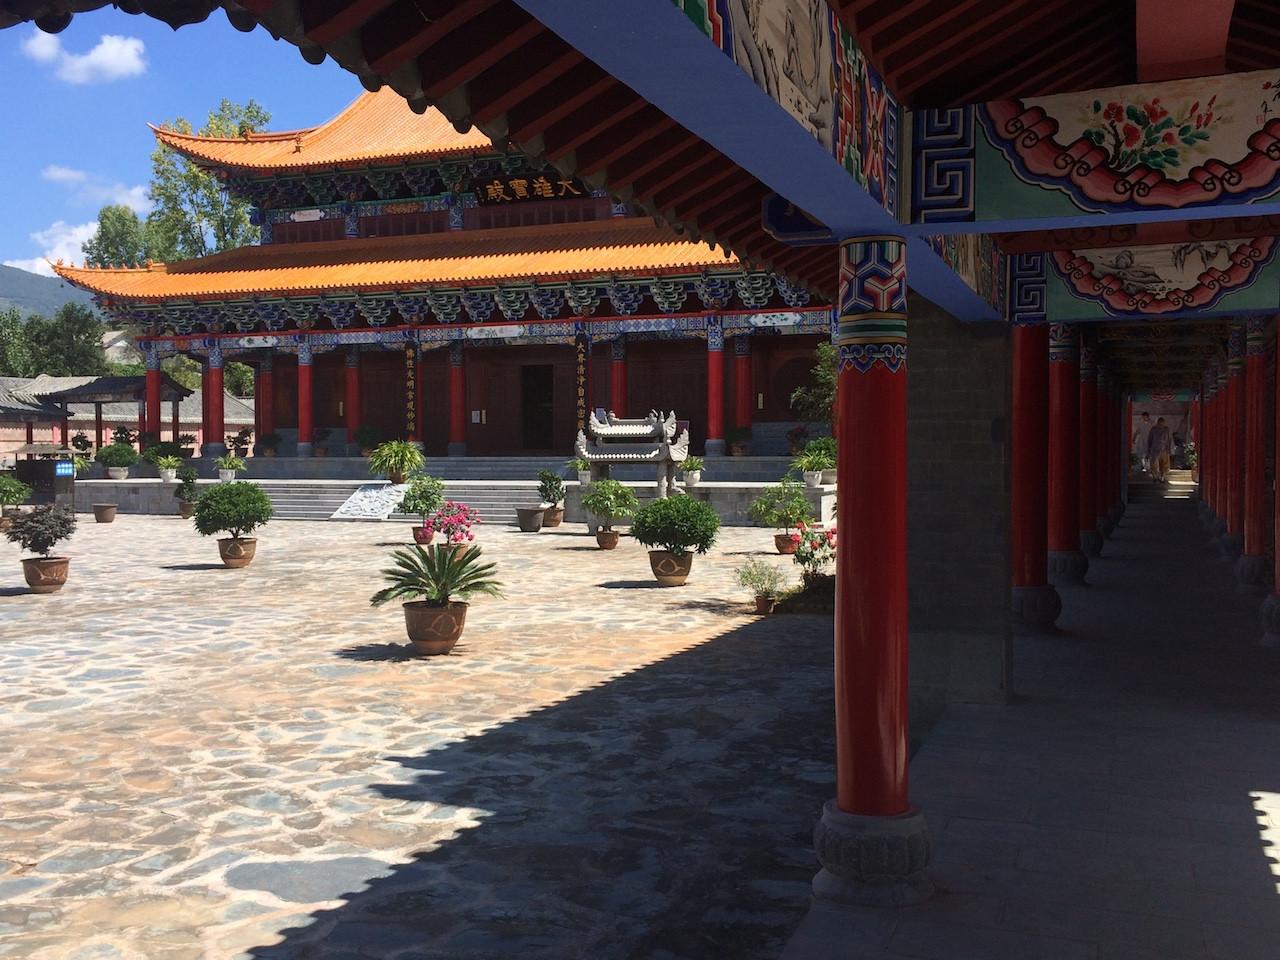 Shaolin KungFu School